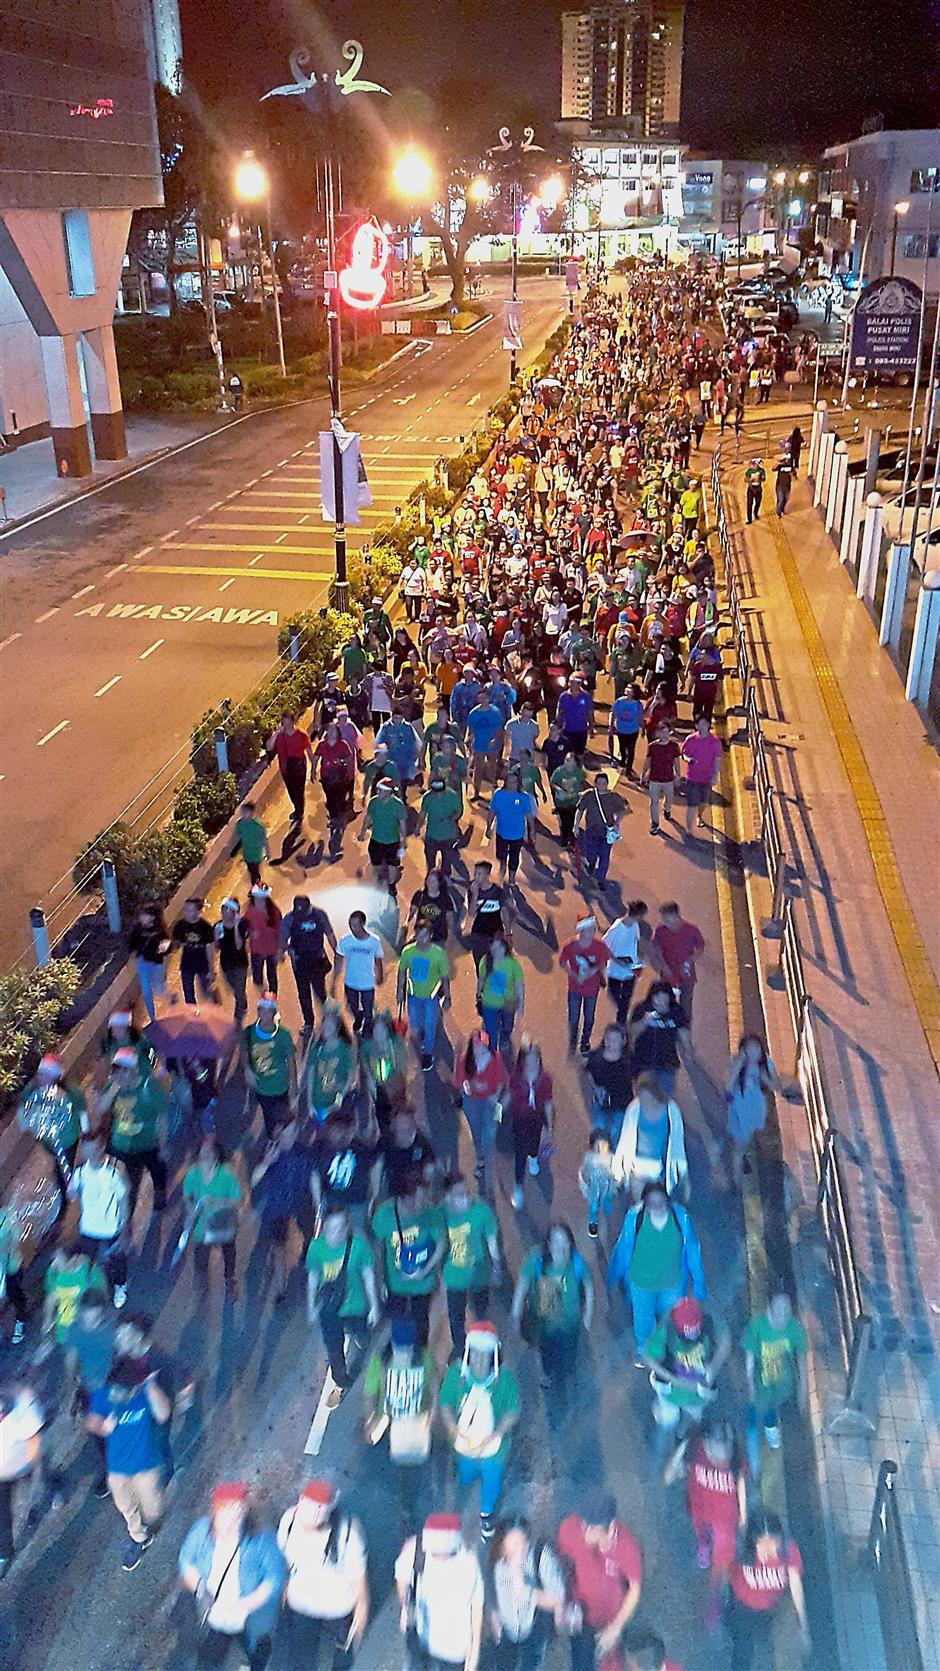 Seasonu2019s greetings:  The crowd of people taking part in the Miri mammoth Christmas parade.